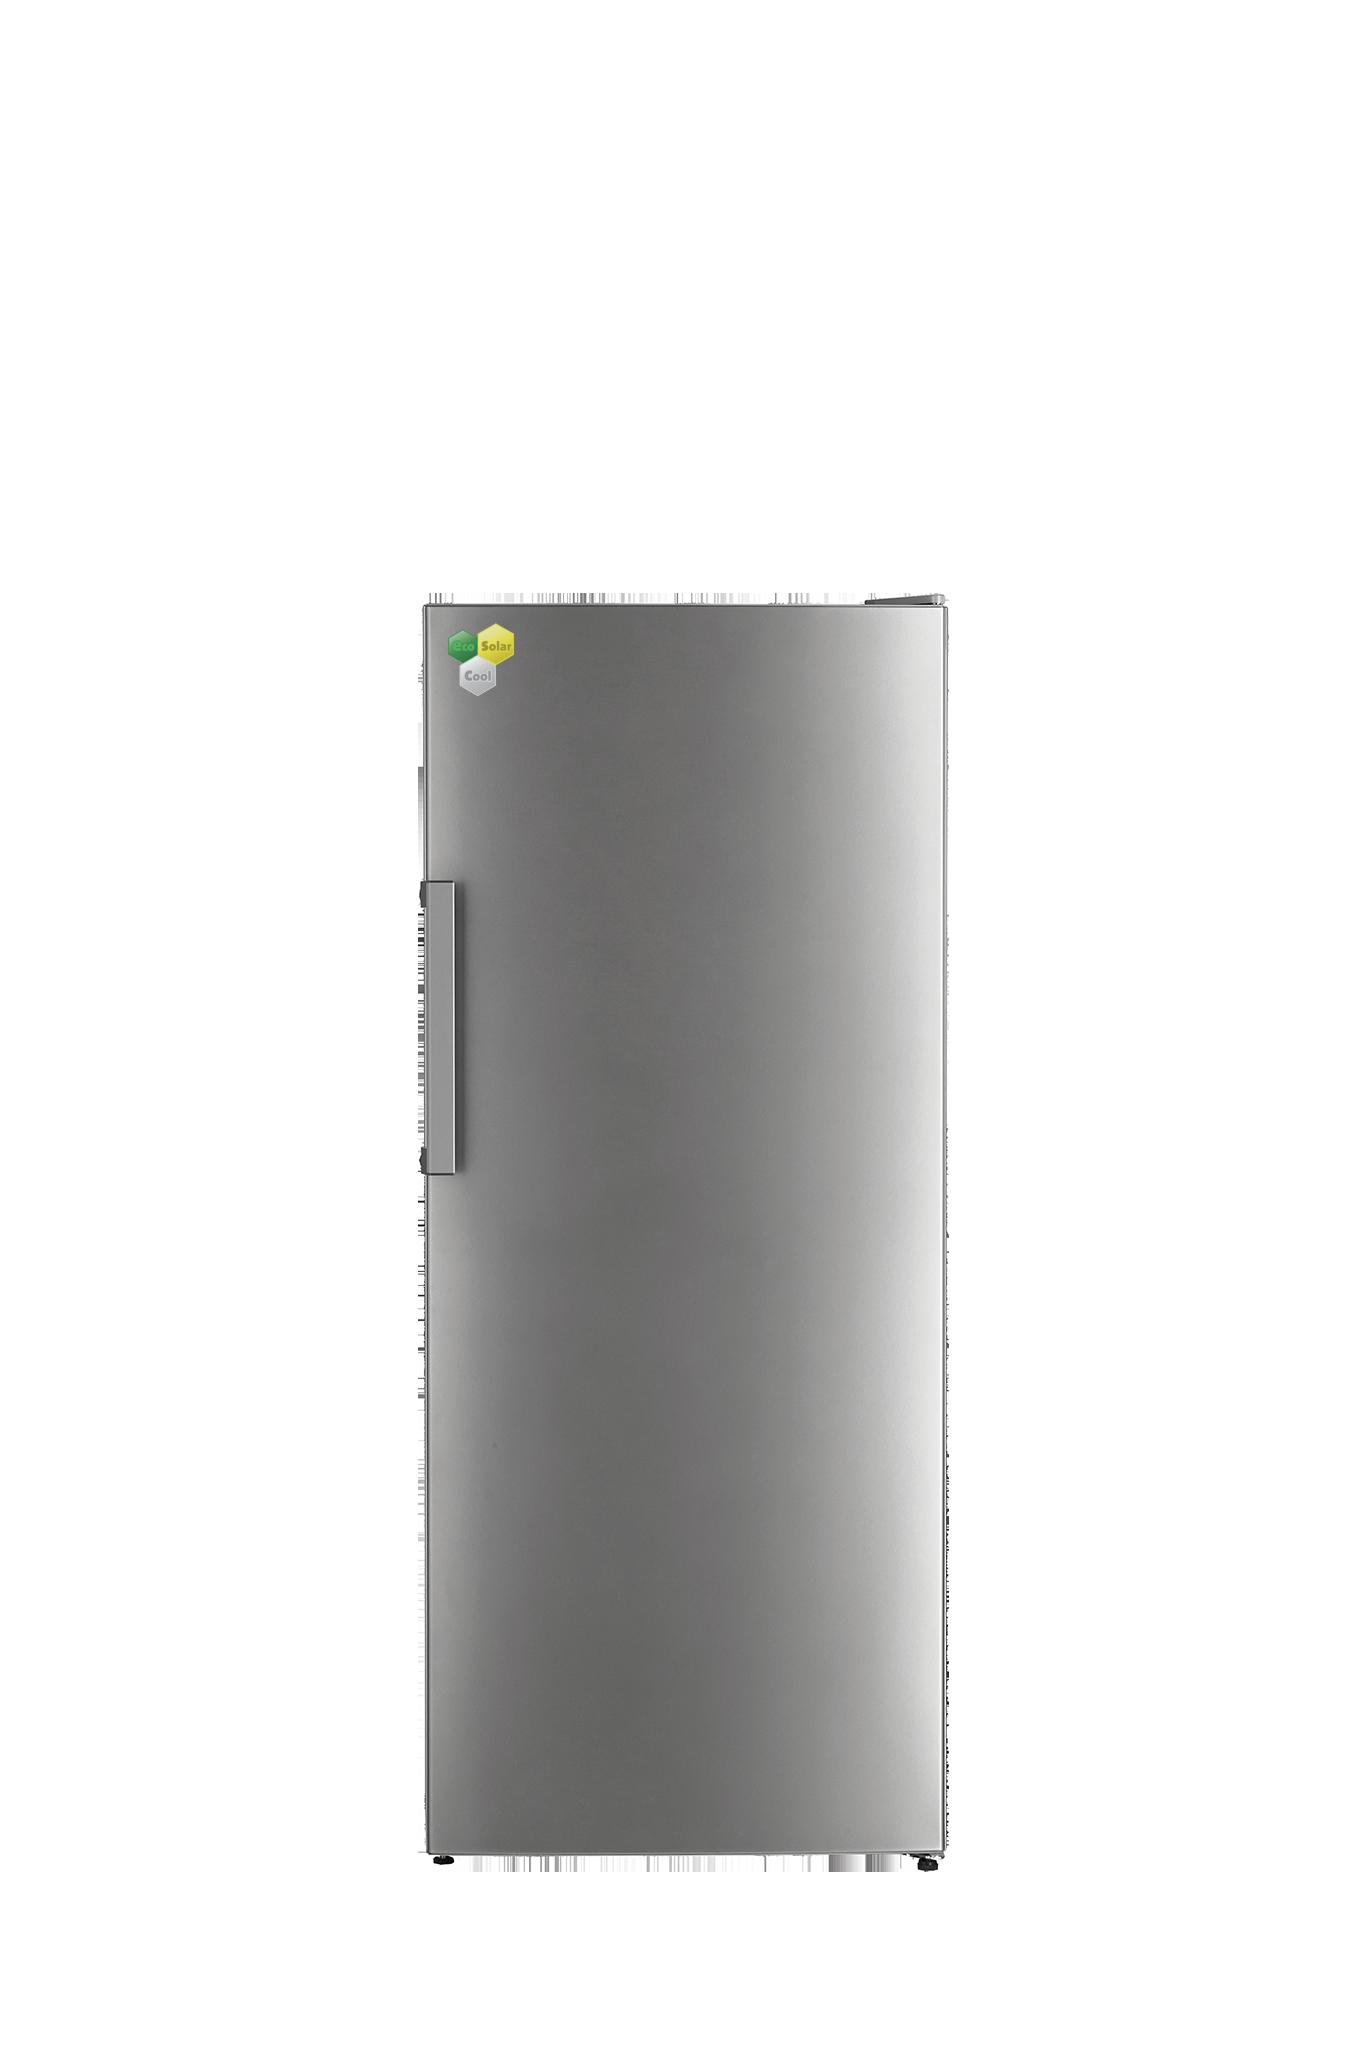 Refrigerator Transparent Images